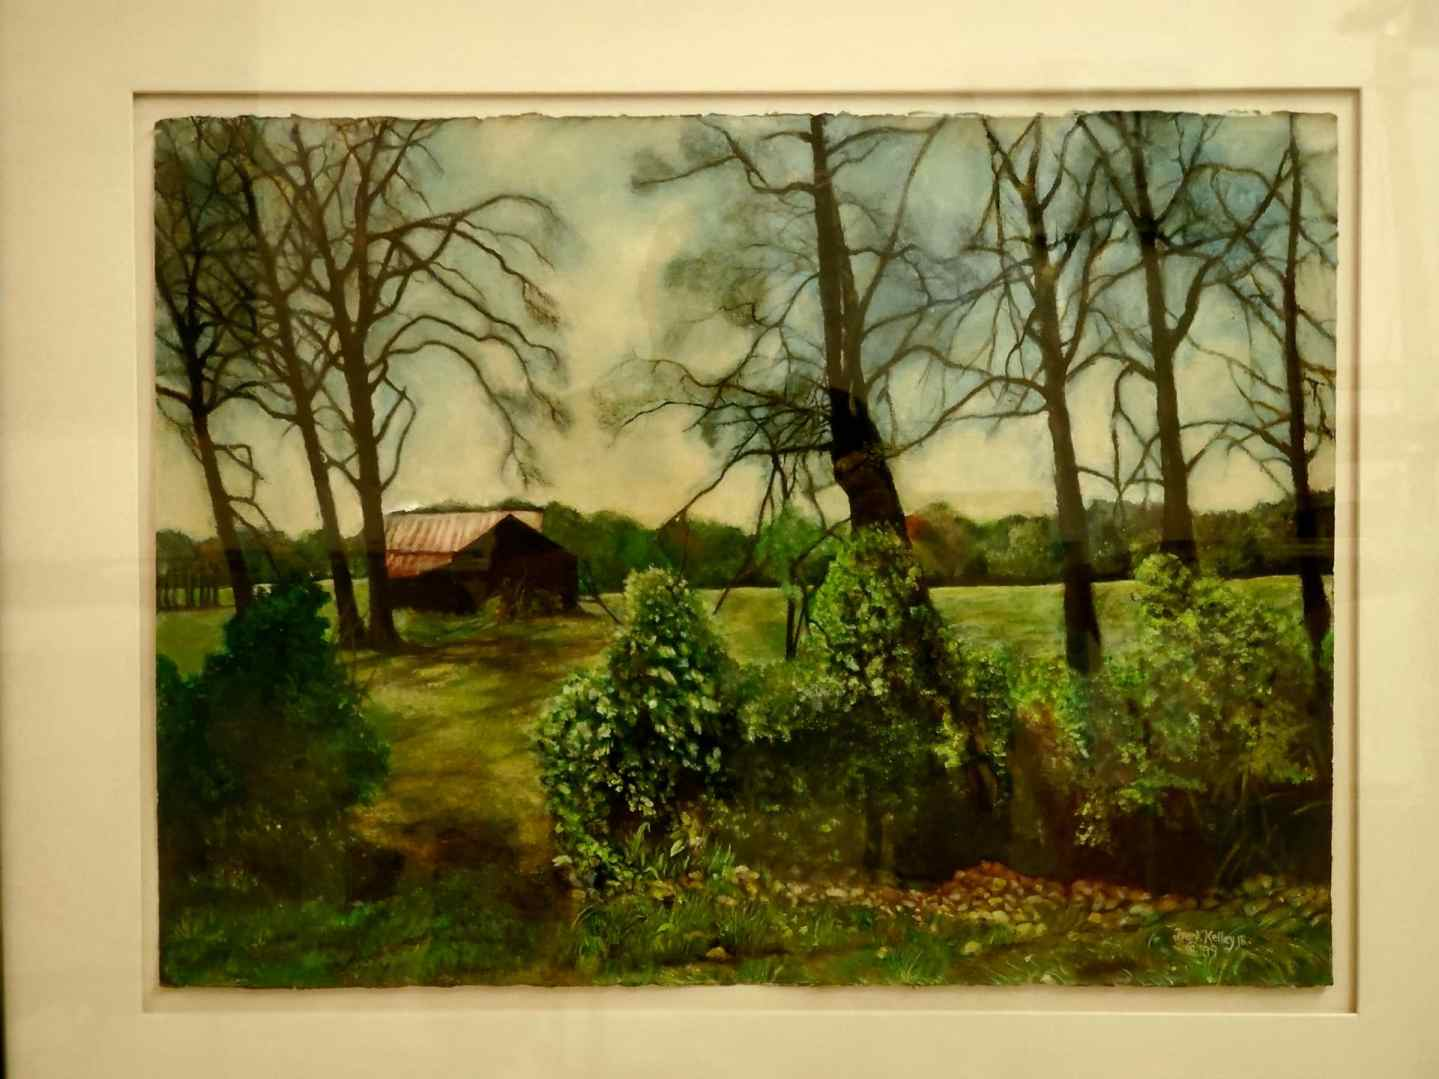 Louisiana Life by Artist Frank Kelley, Jr.